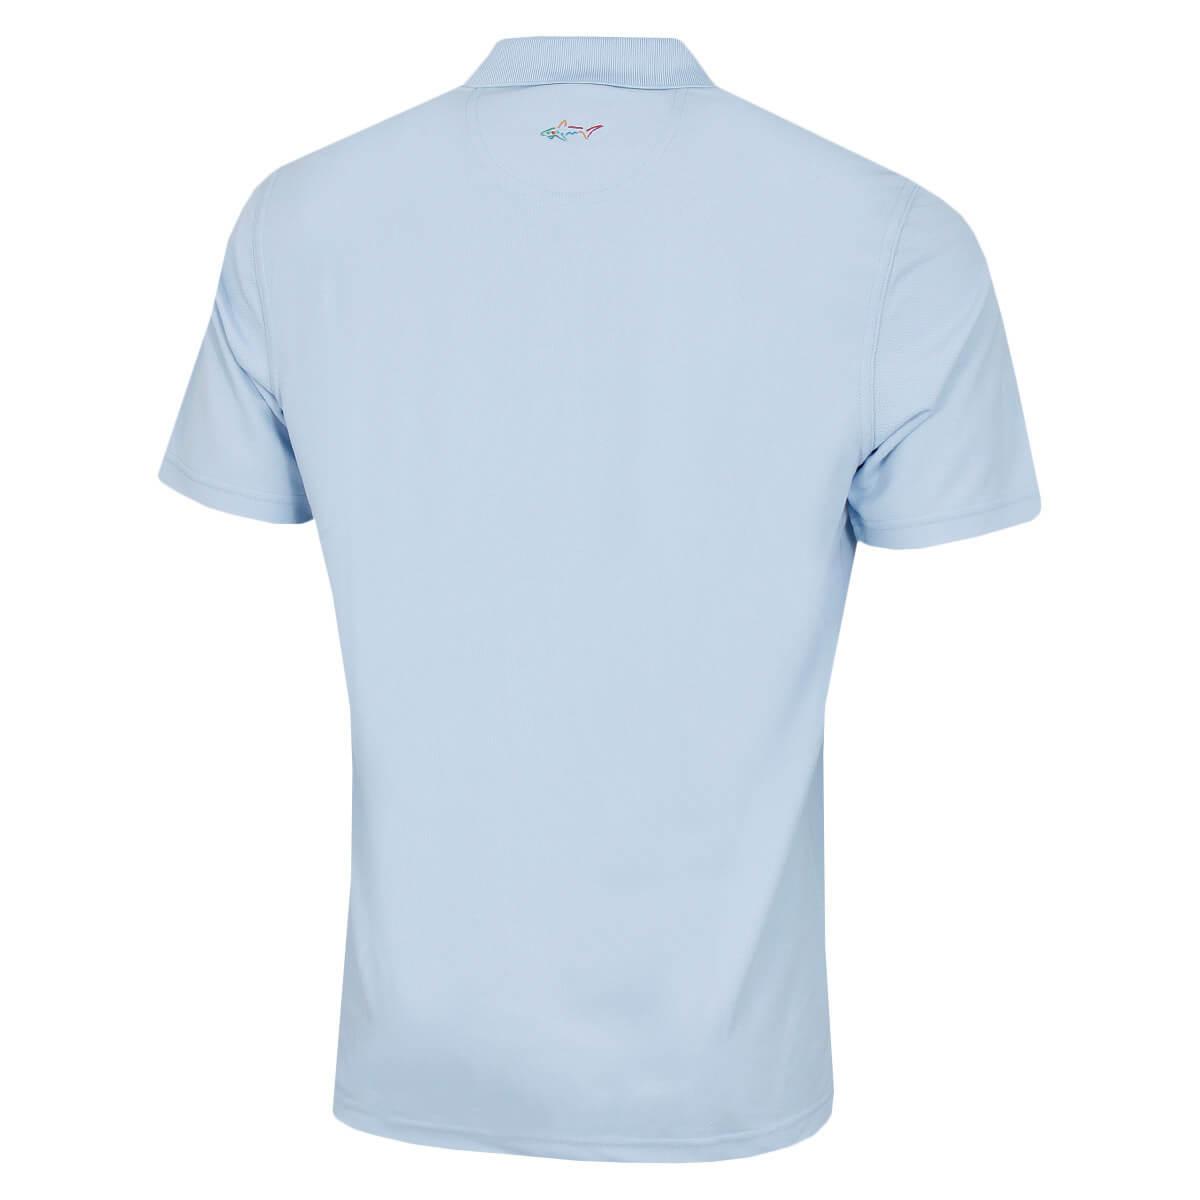 Greg-Norman-Mens-KX04-Performance-Micro-Pique-Golf-Polo-Shirt-28-OFF-RRP thumbnail 14